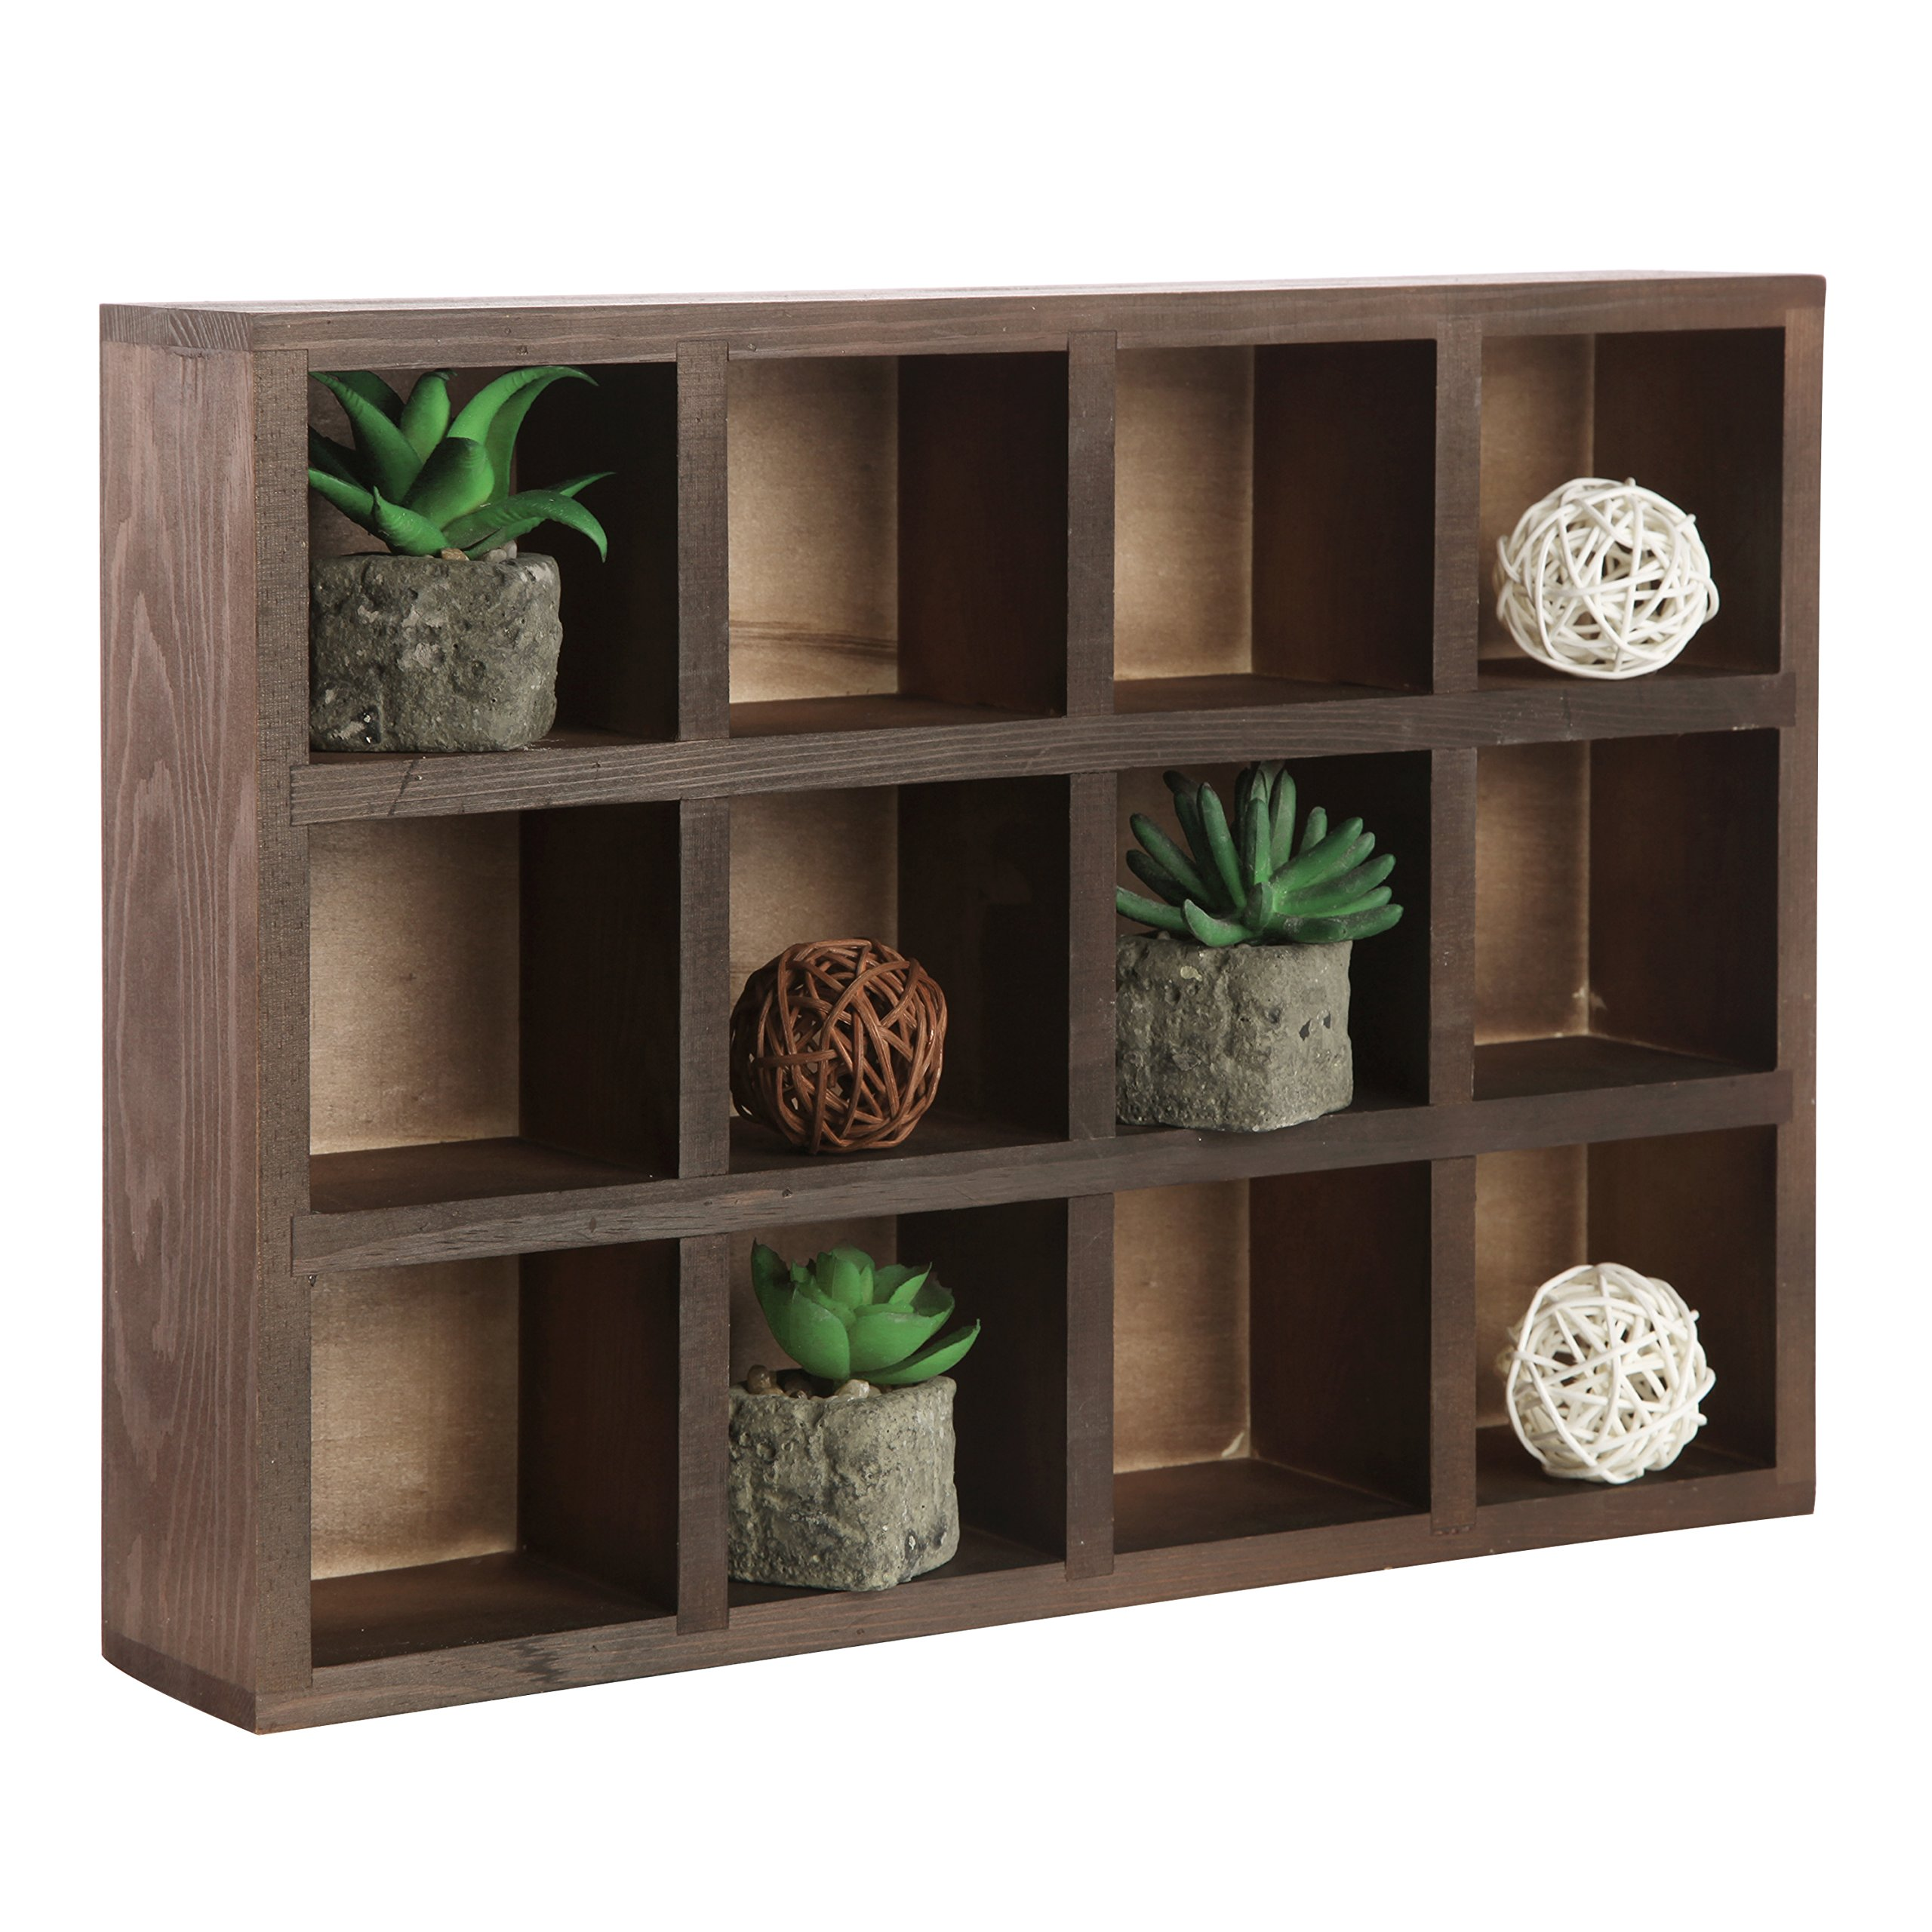 box shelving amazon com rh amazon com